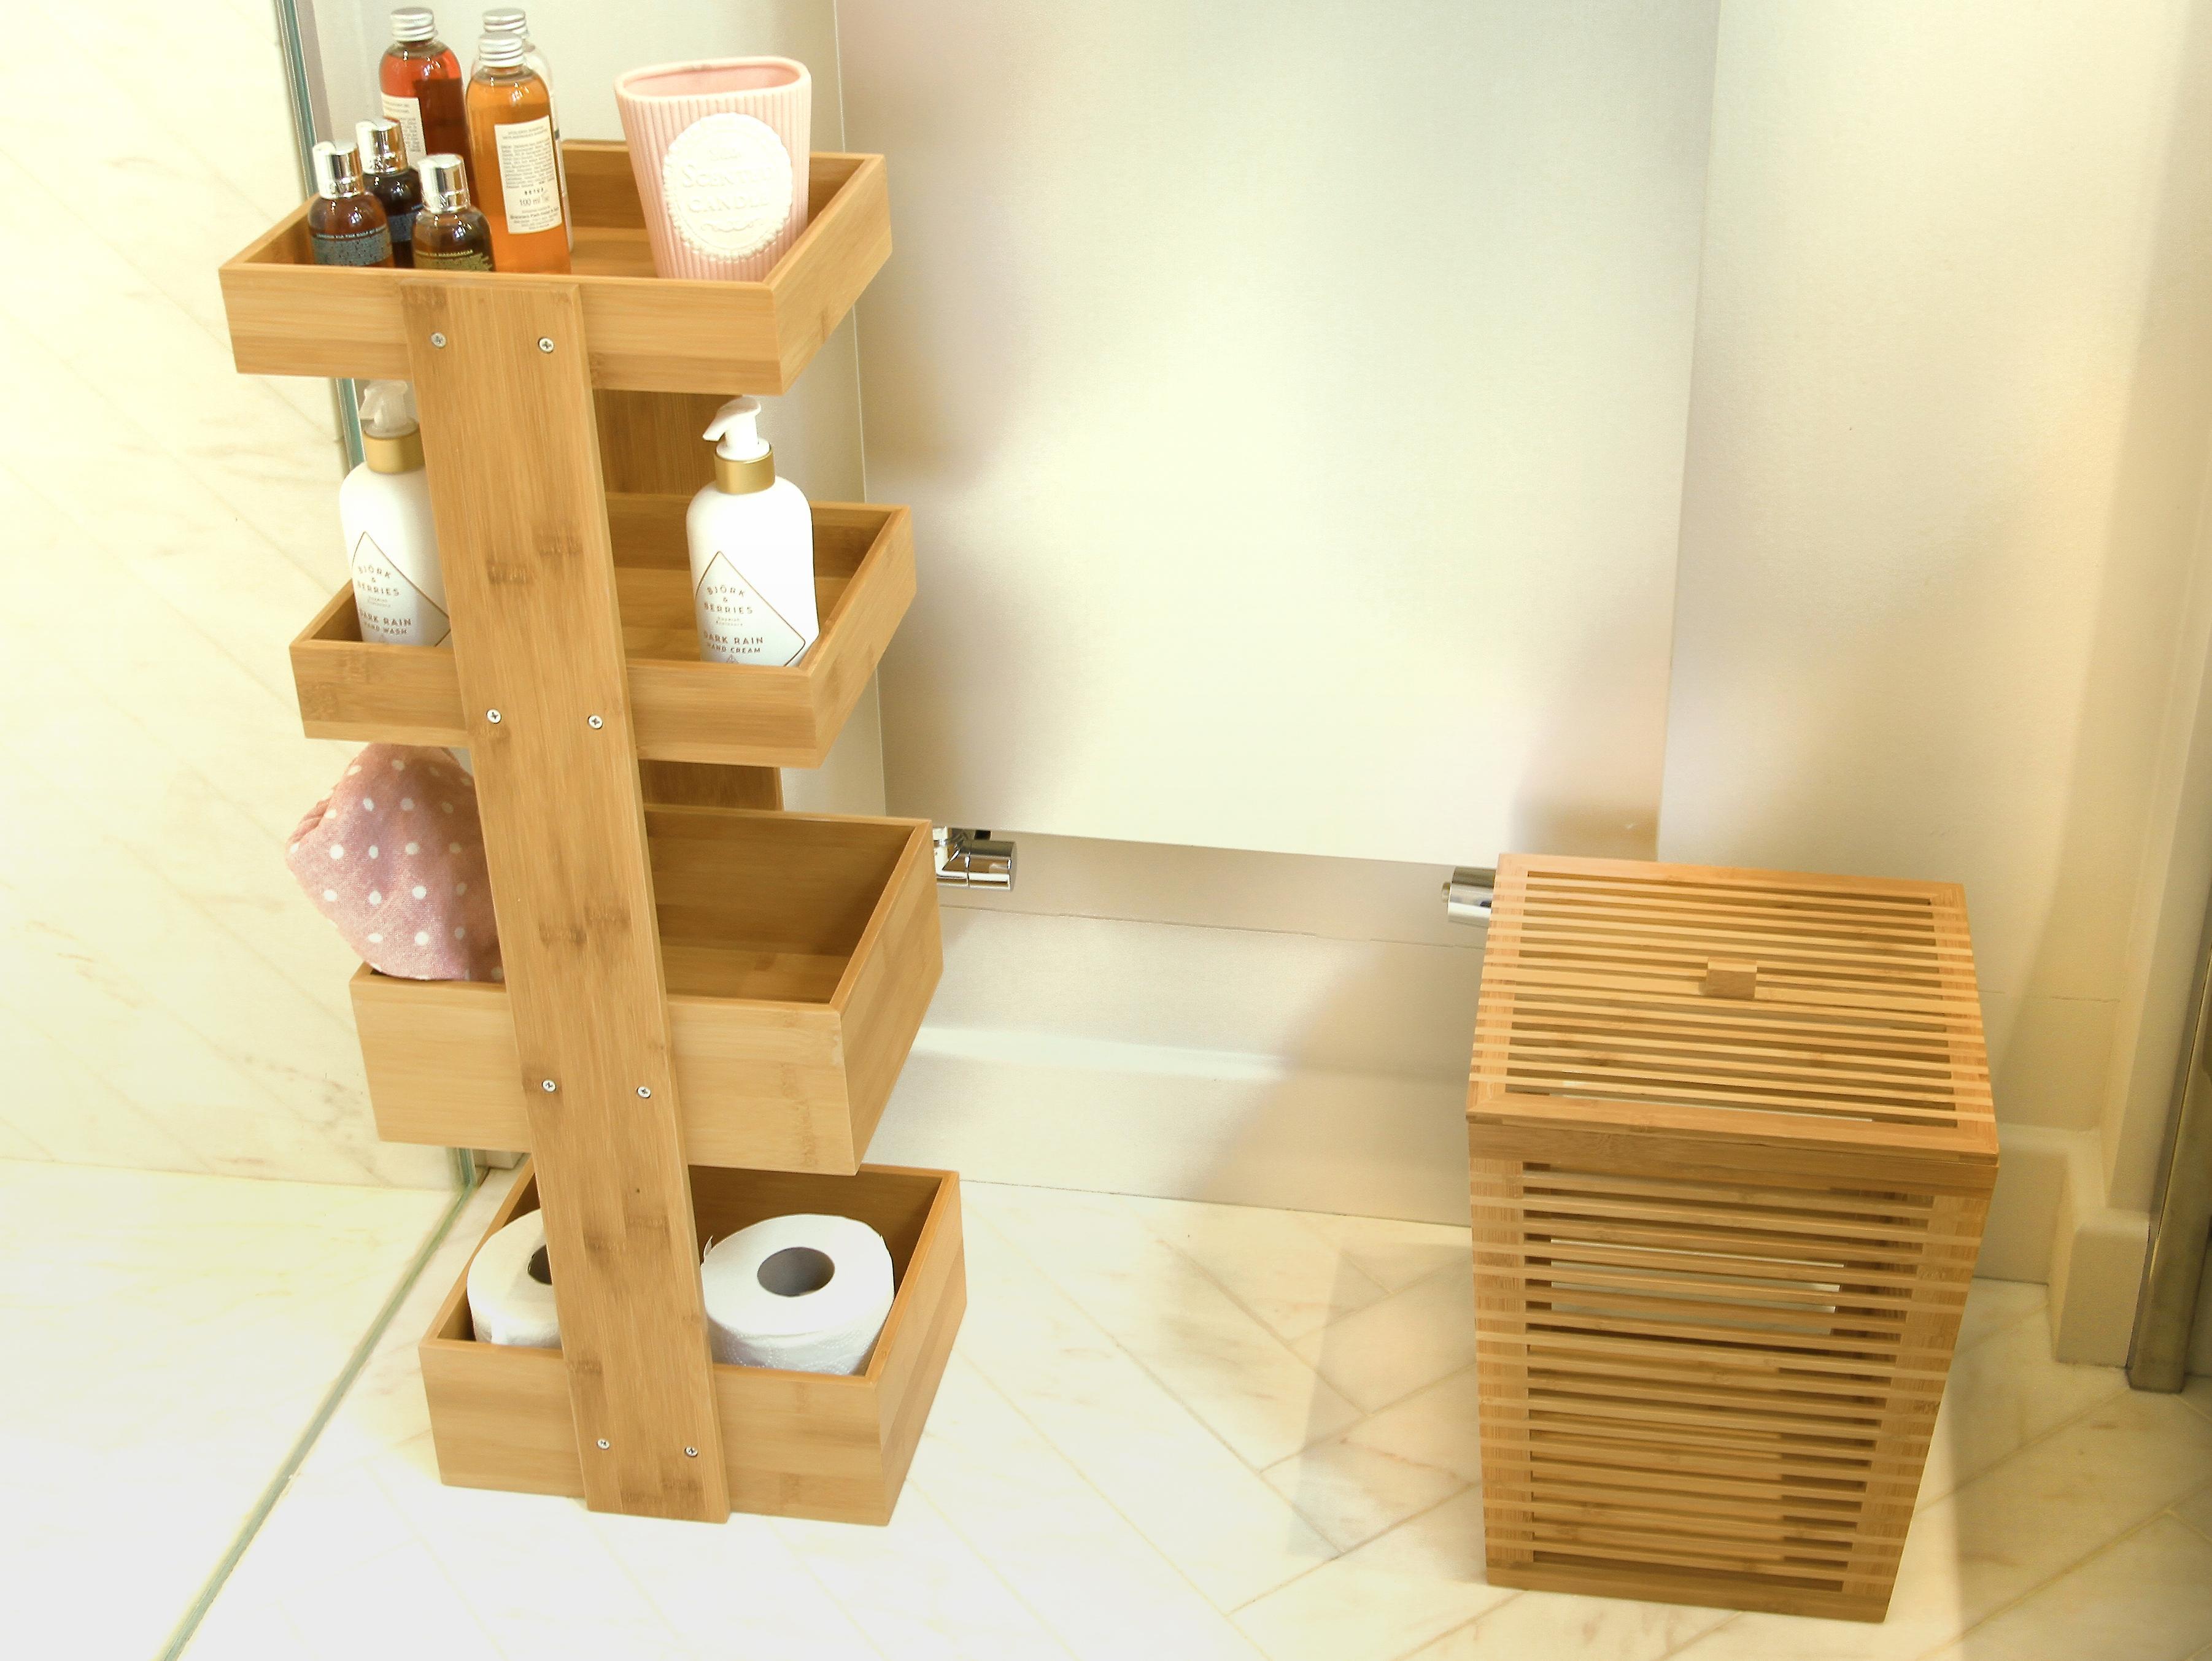 Woodquail Bathroom Bin with Lid H 32 cm, Made of Waterproof Bamboo